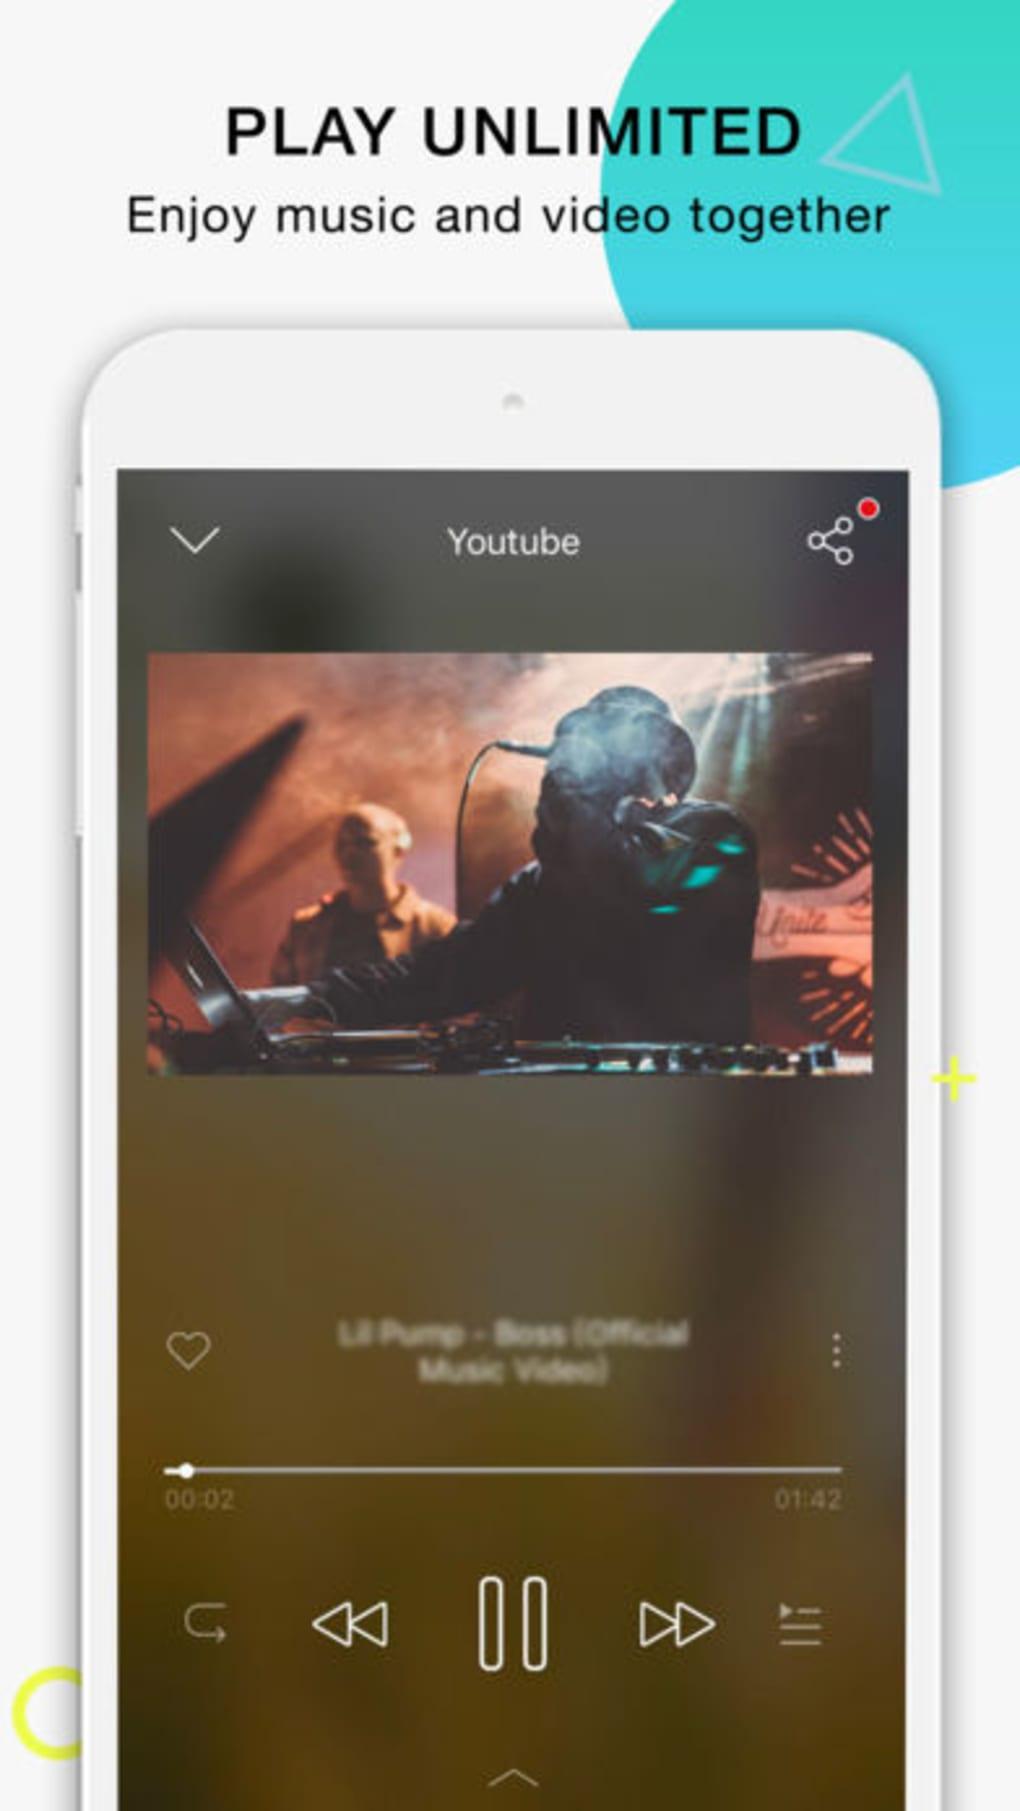 Music fm app iphone | Top 3 FREE Music Stream/Download